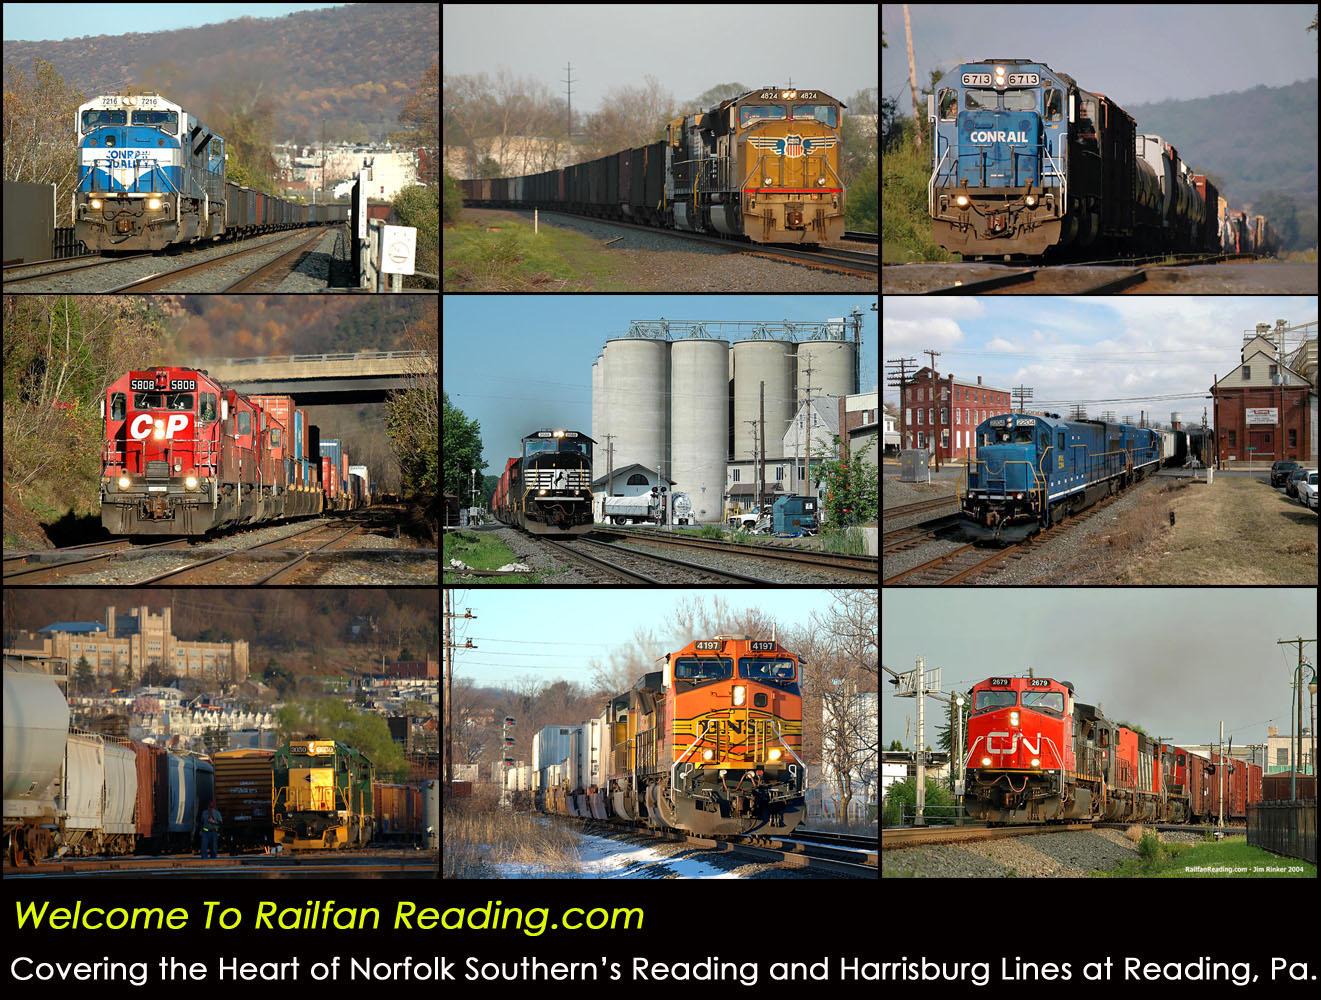 Railfanning Reading